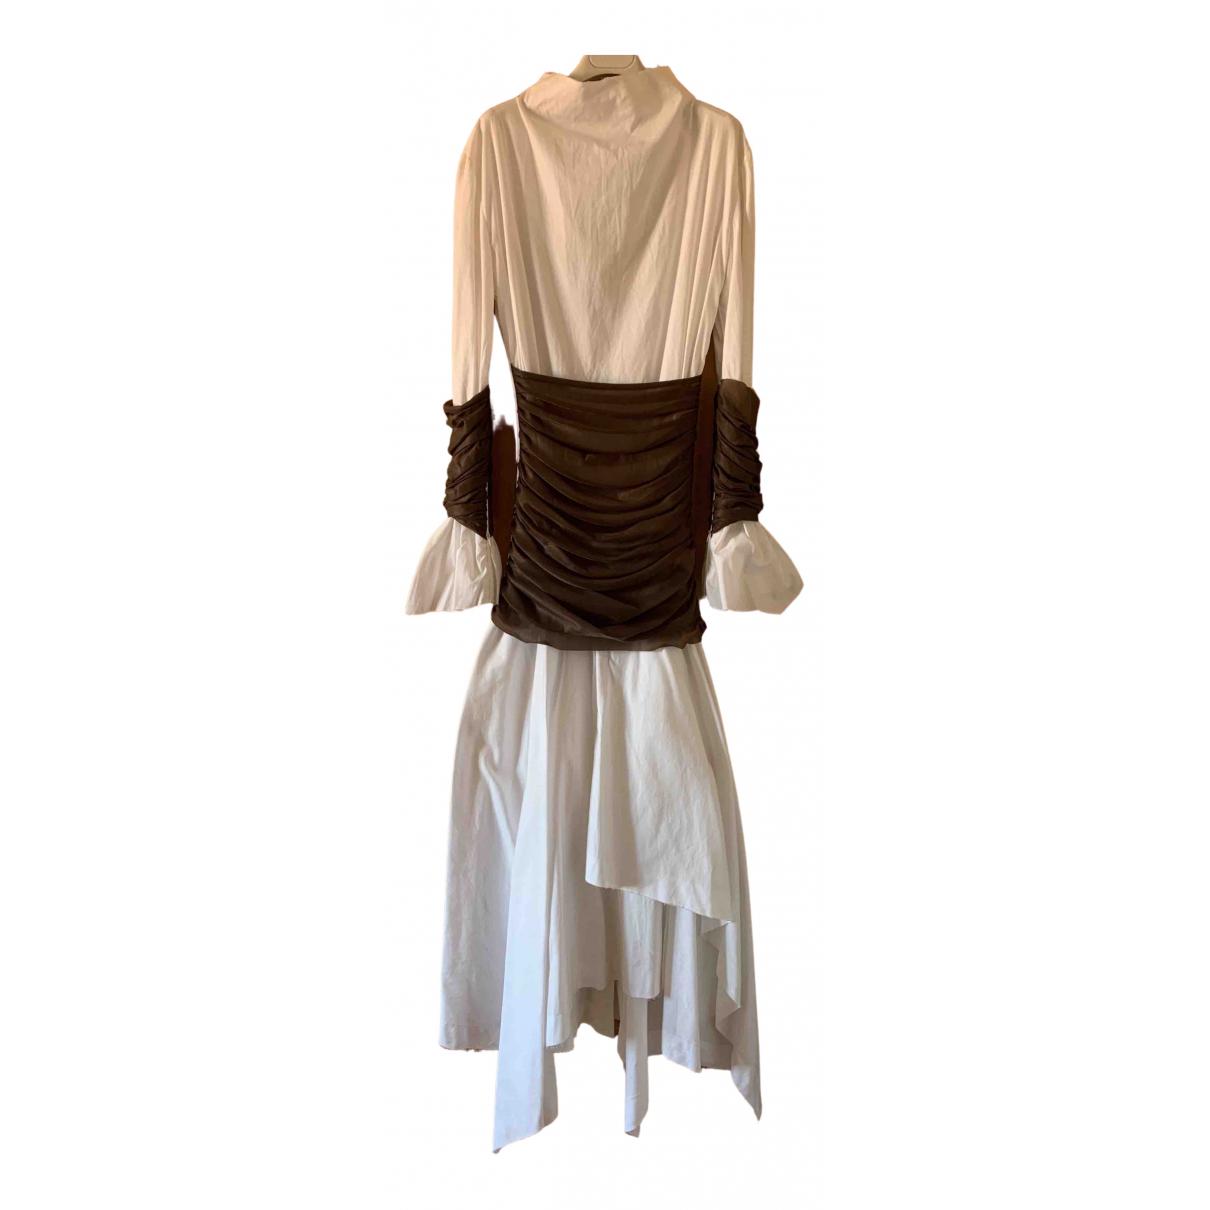 Loewe N White Cotton dress for Women S International